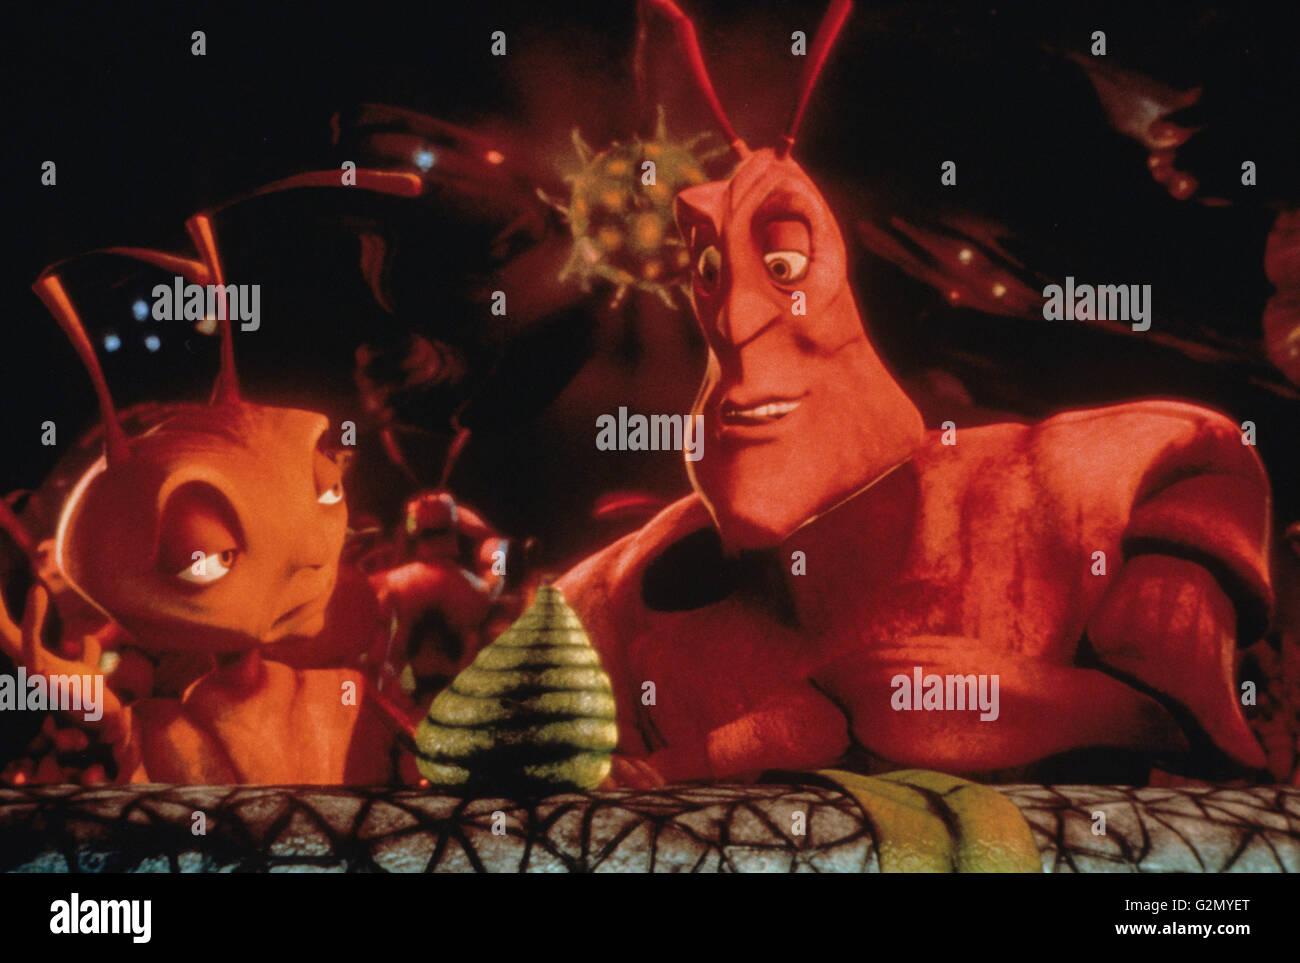 cyberworld,2000 - Stock Image